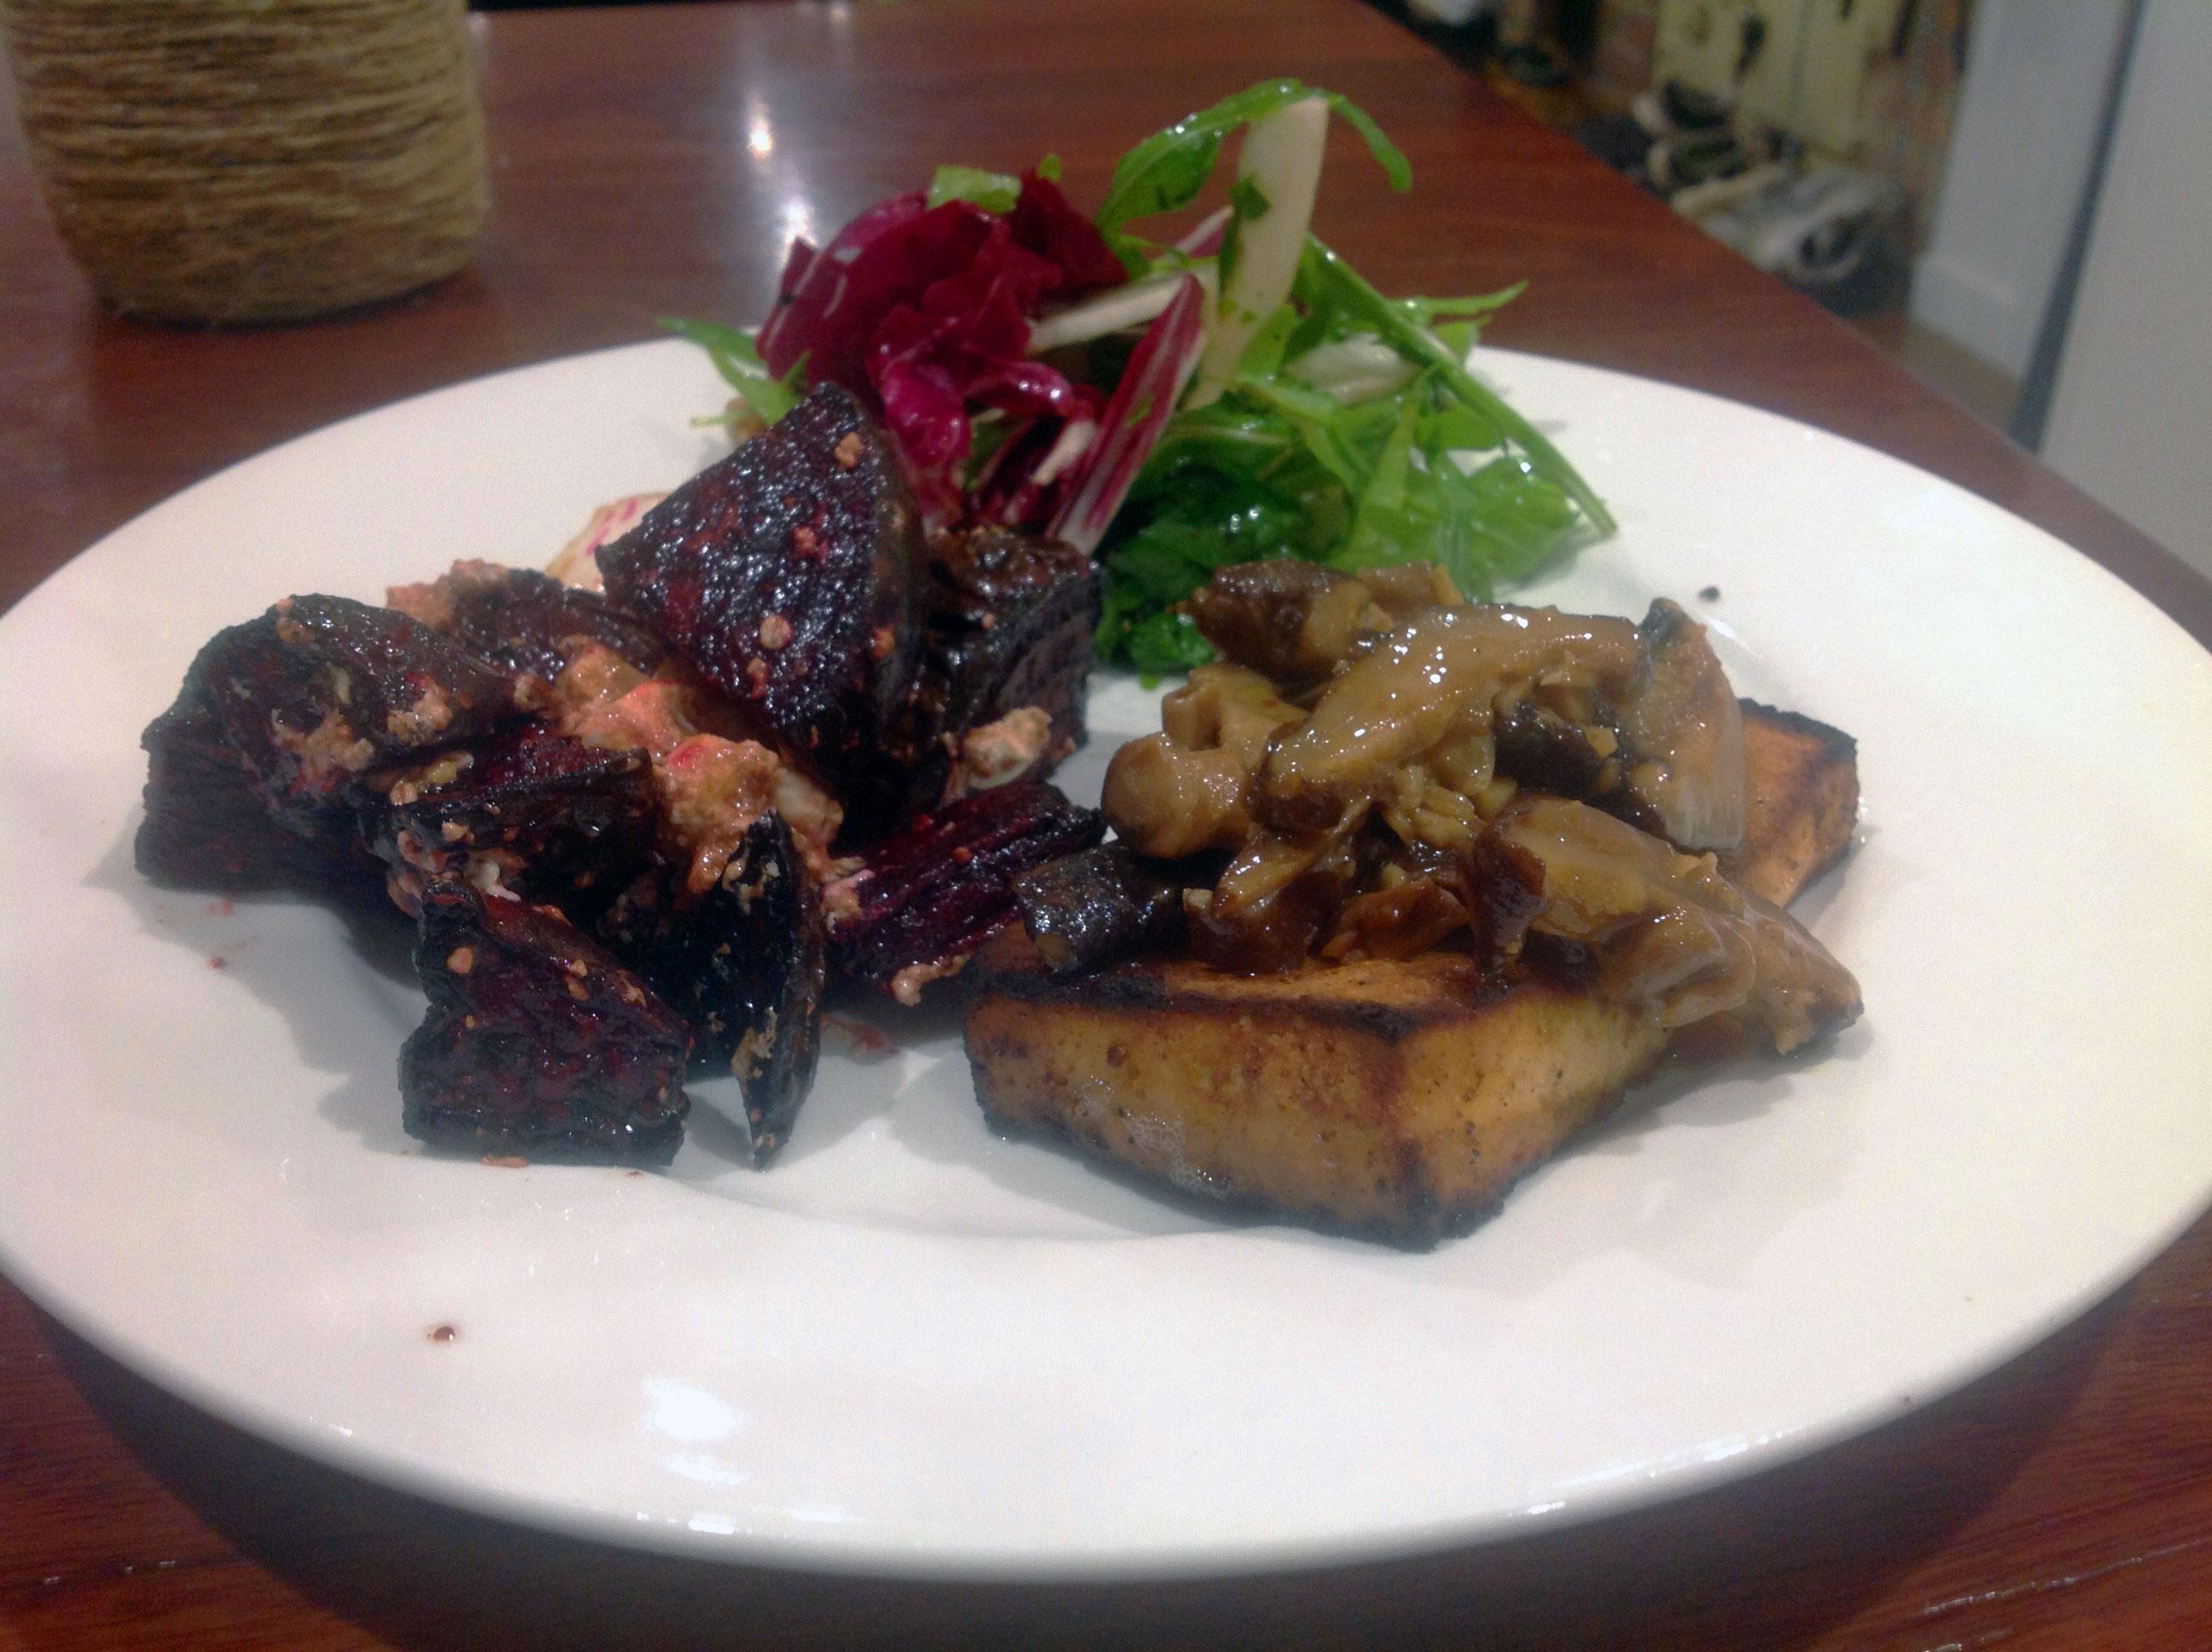 The finished dish, tofu steak with mushroom ragout recipe